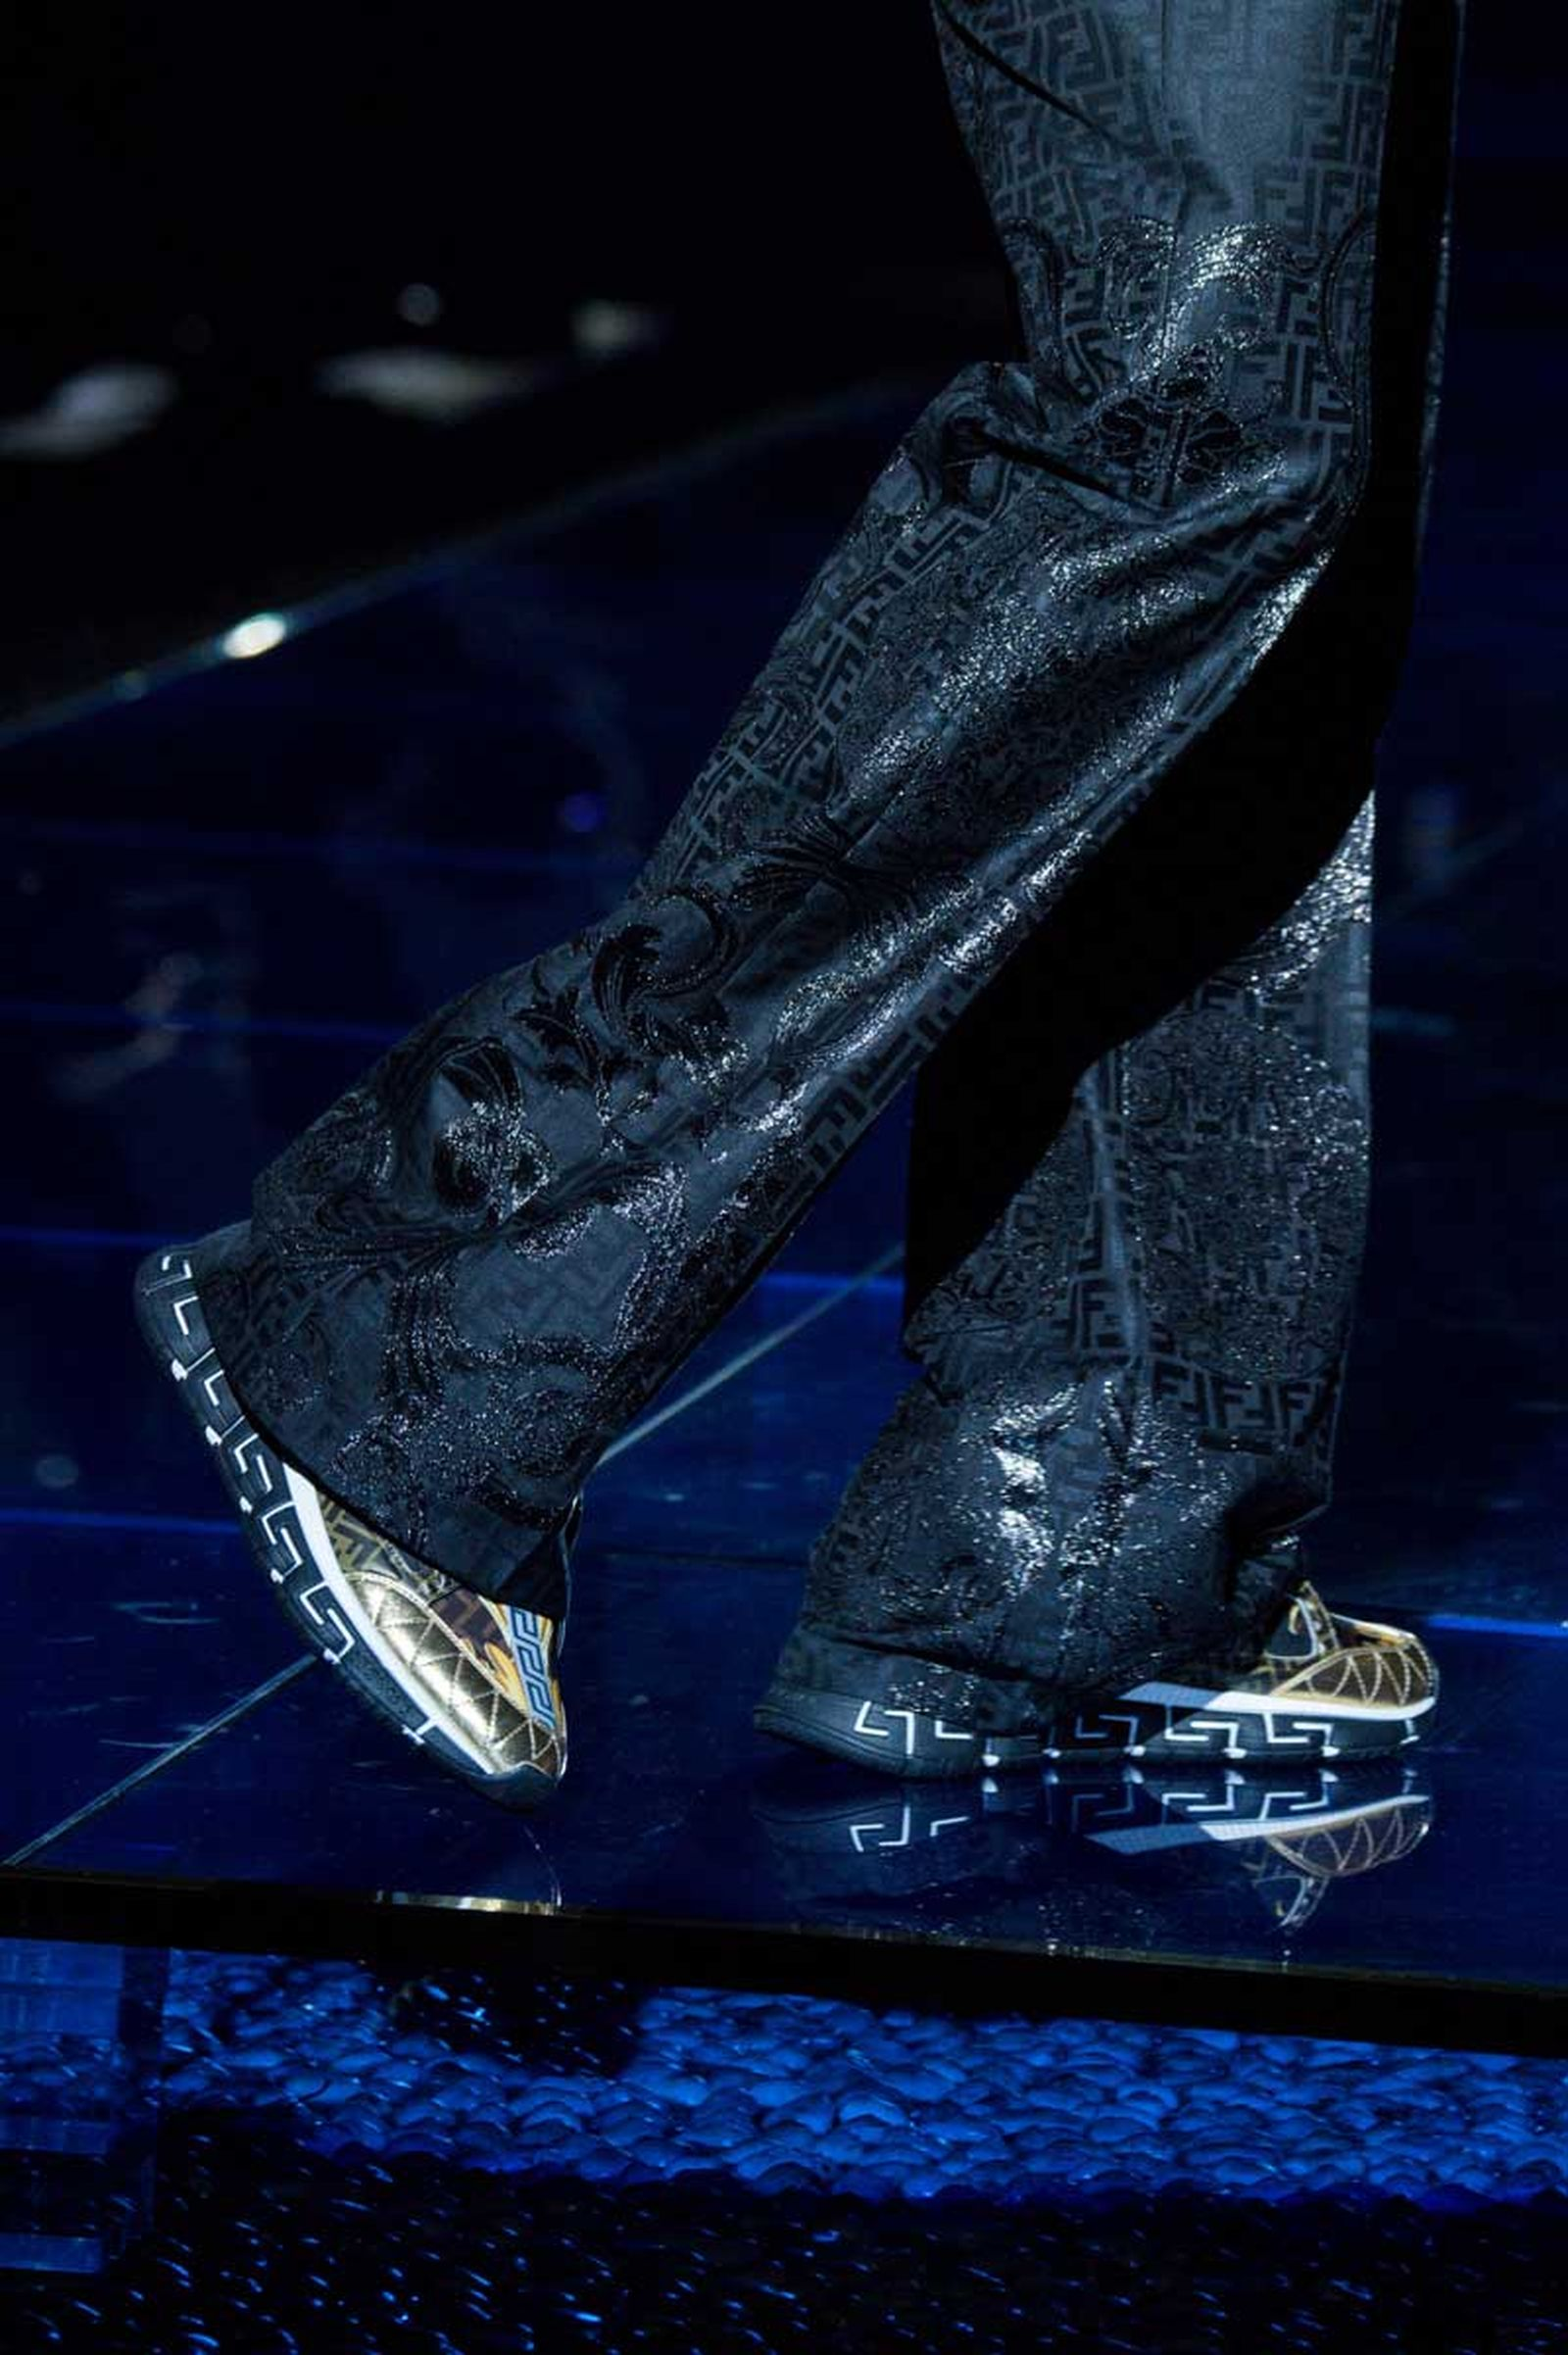 versace-fendi-collab--(20)